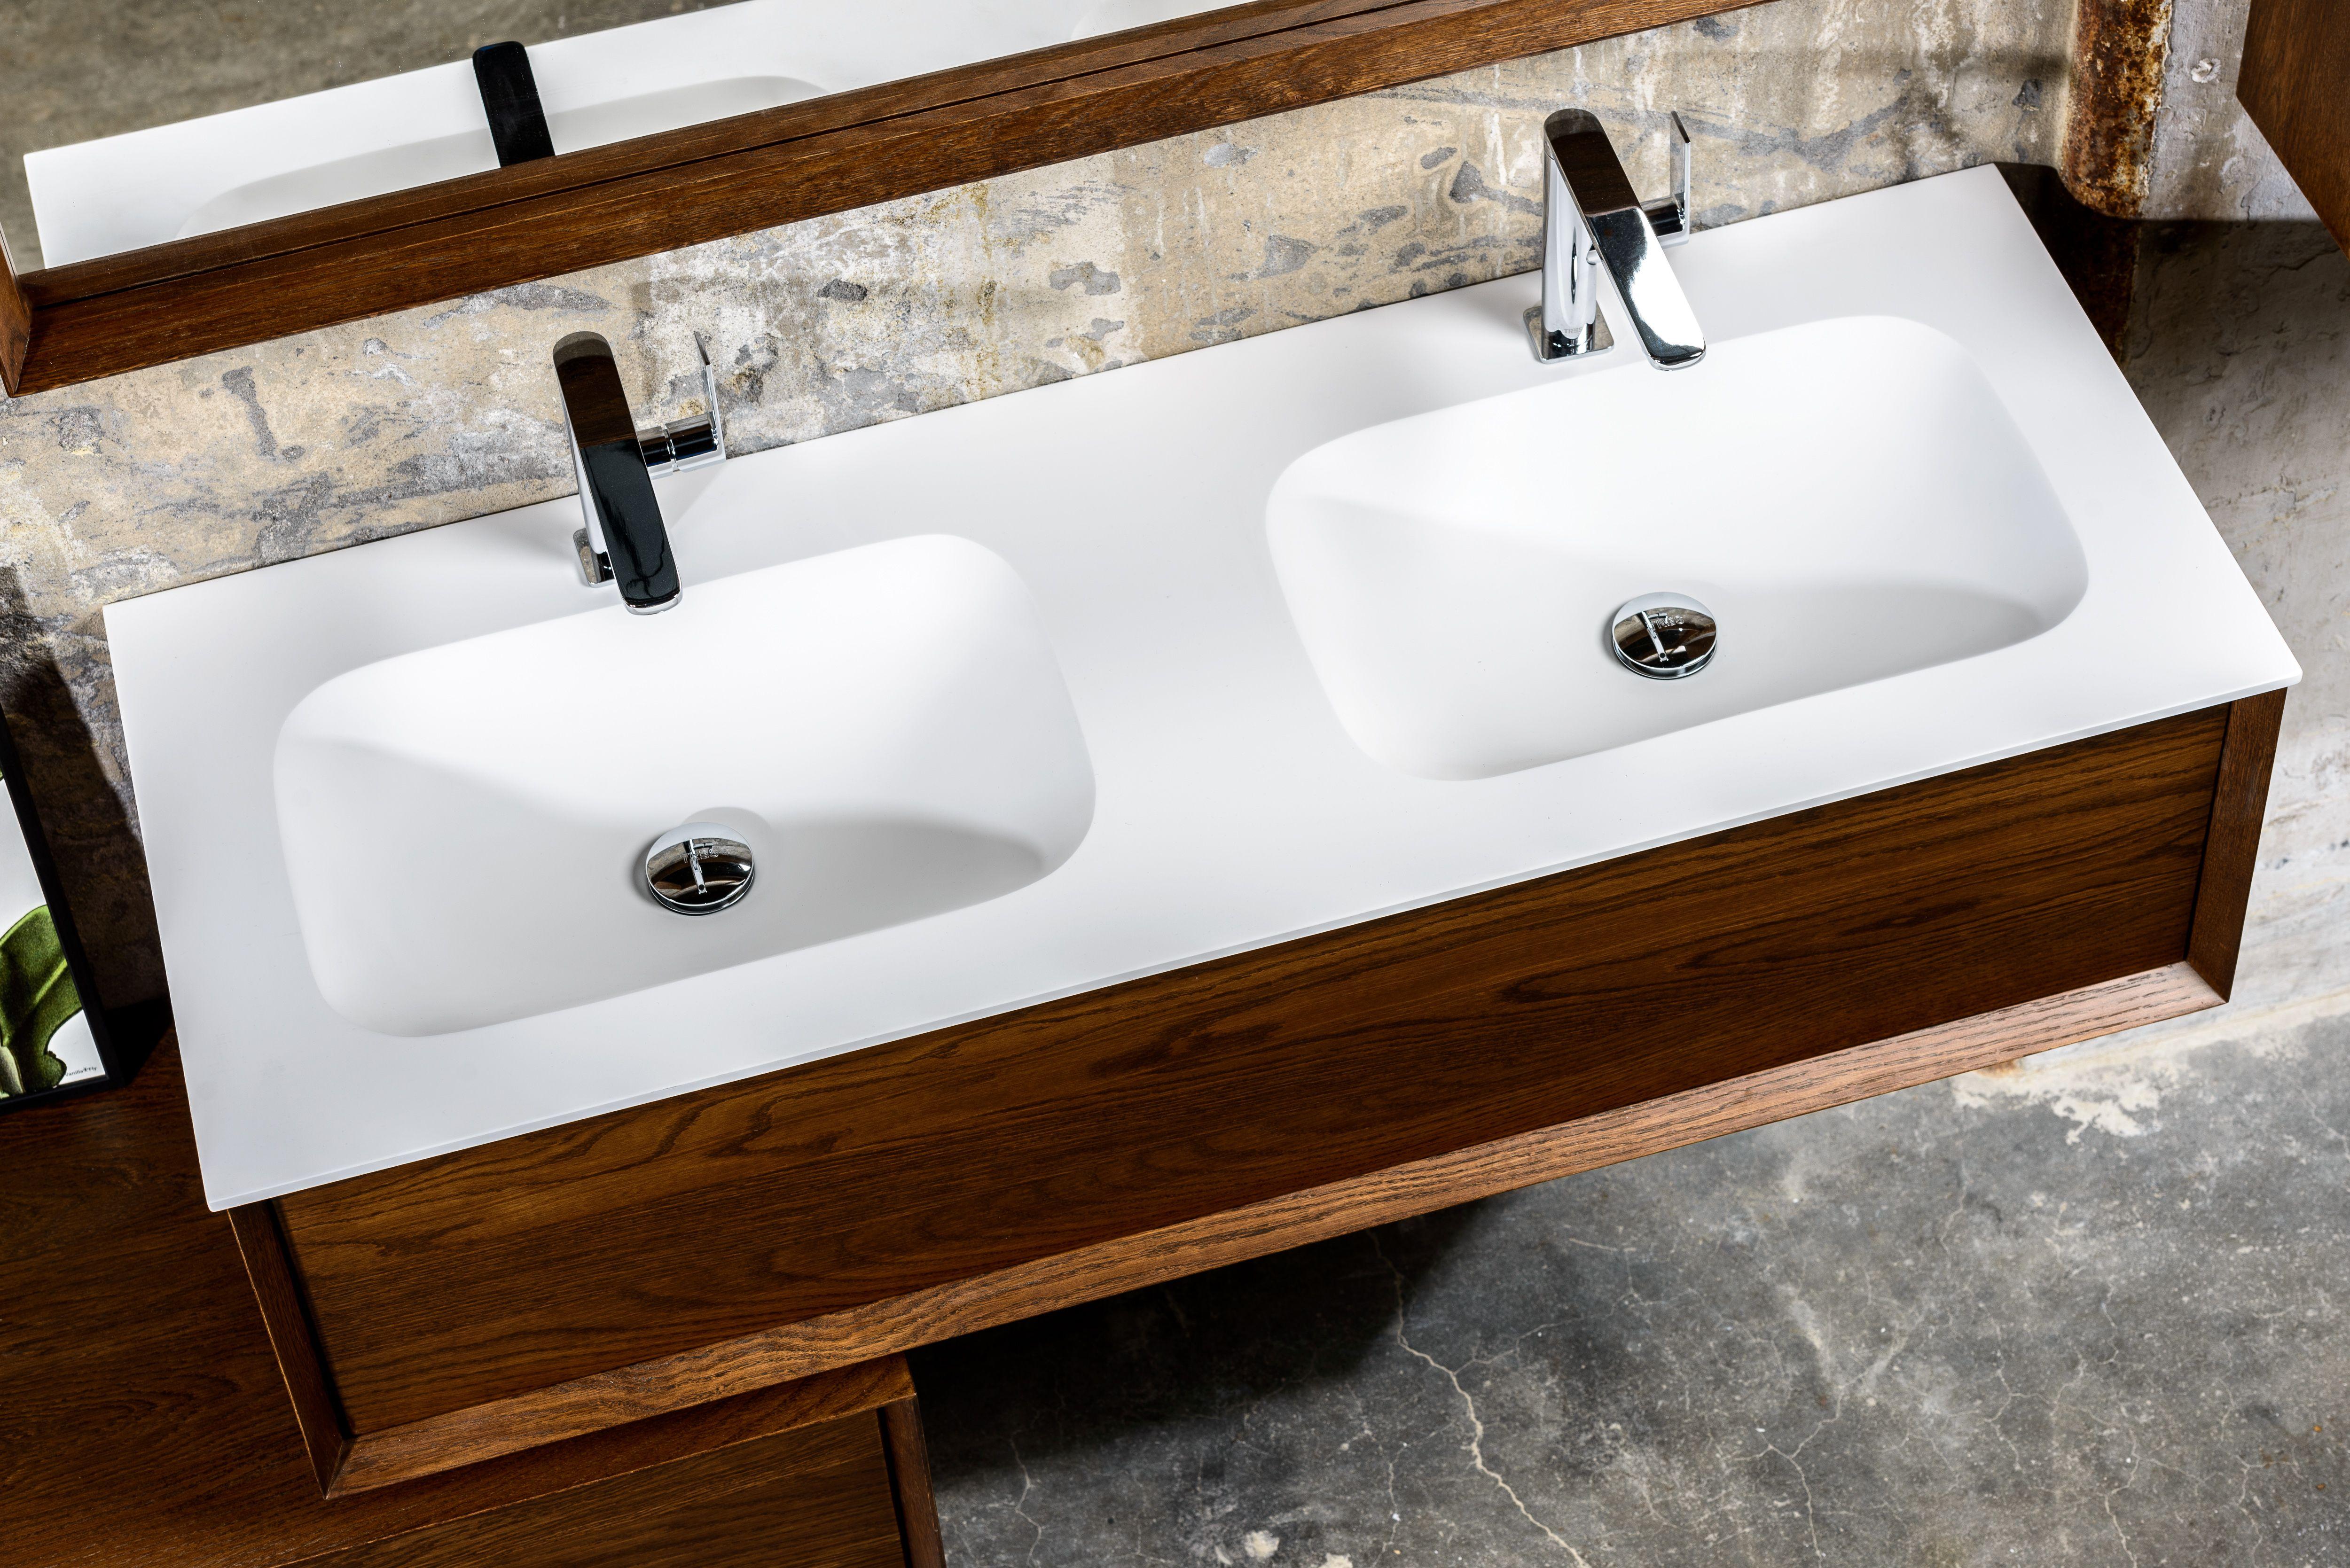 Coff badmeubel cm massief hout met dubbele wasbak badkamer